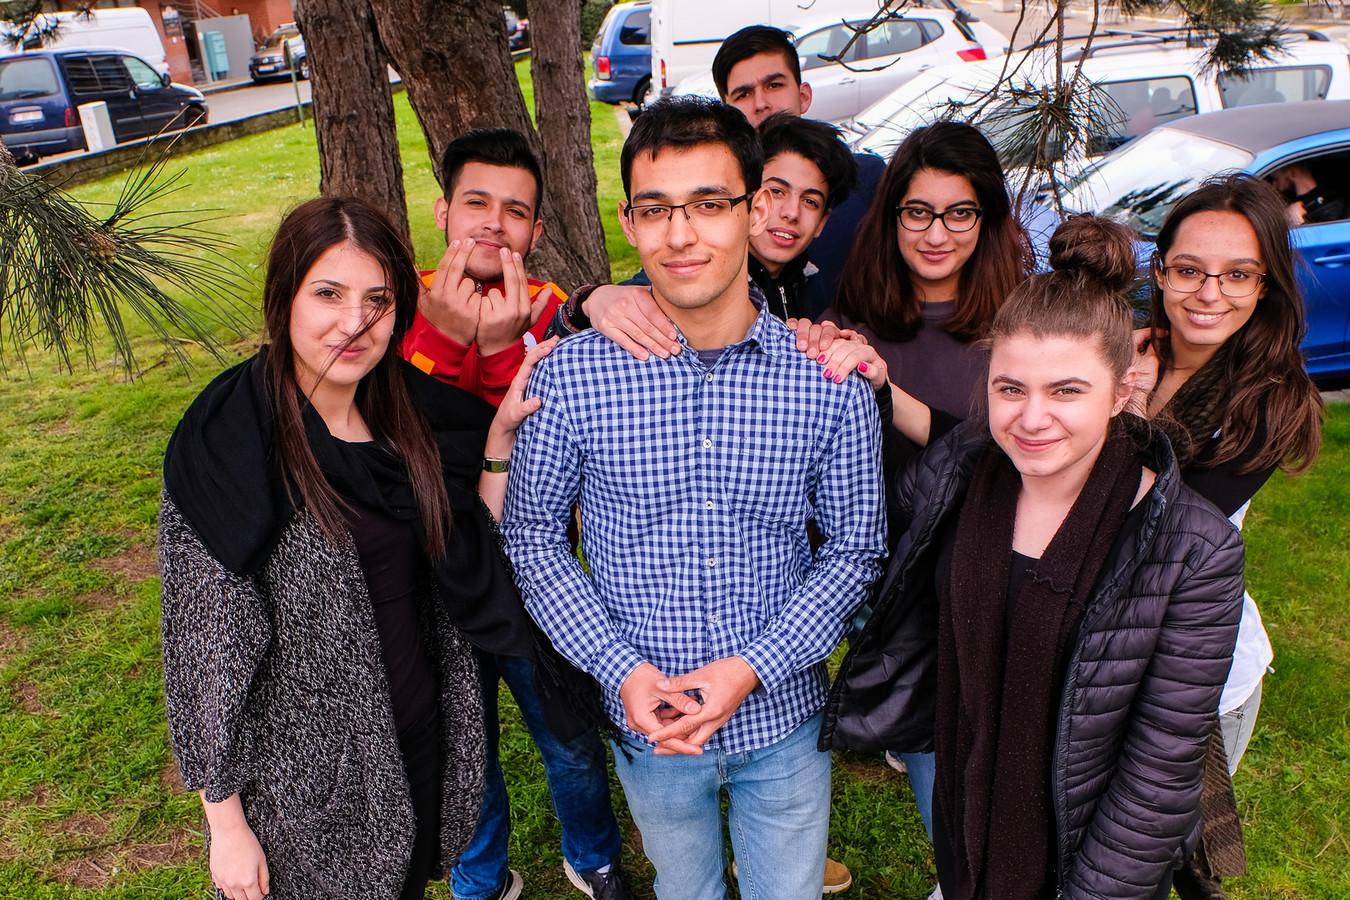 Omran met zijn klasgenoten Esin, Selahattin, Husseyin, Salmane, Maryame, Eylem en Vloriana.